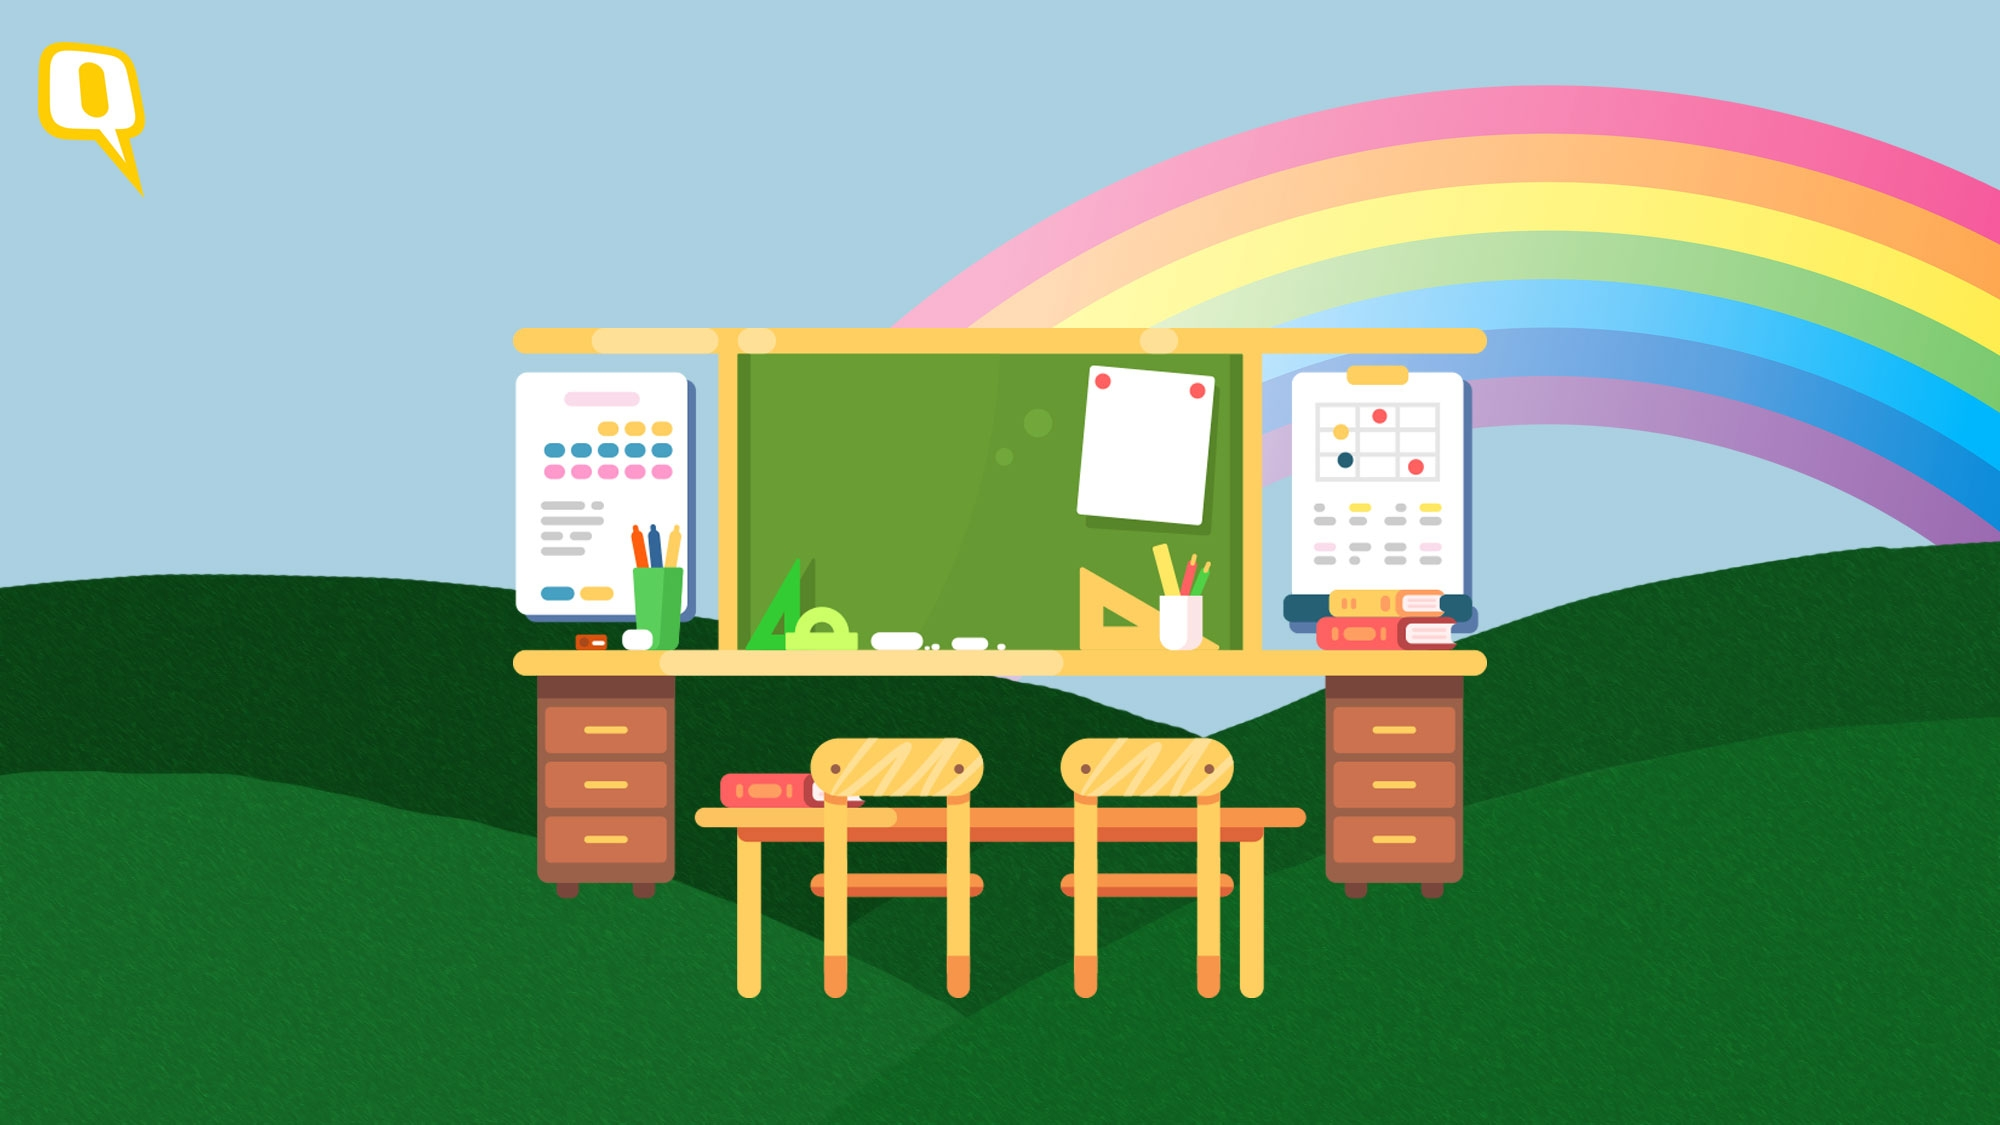 Innovative Outdoor Classroom ~ Outdoor classroom day why kids need innovative ways of